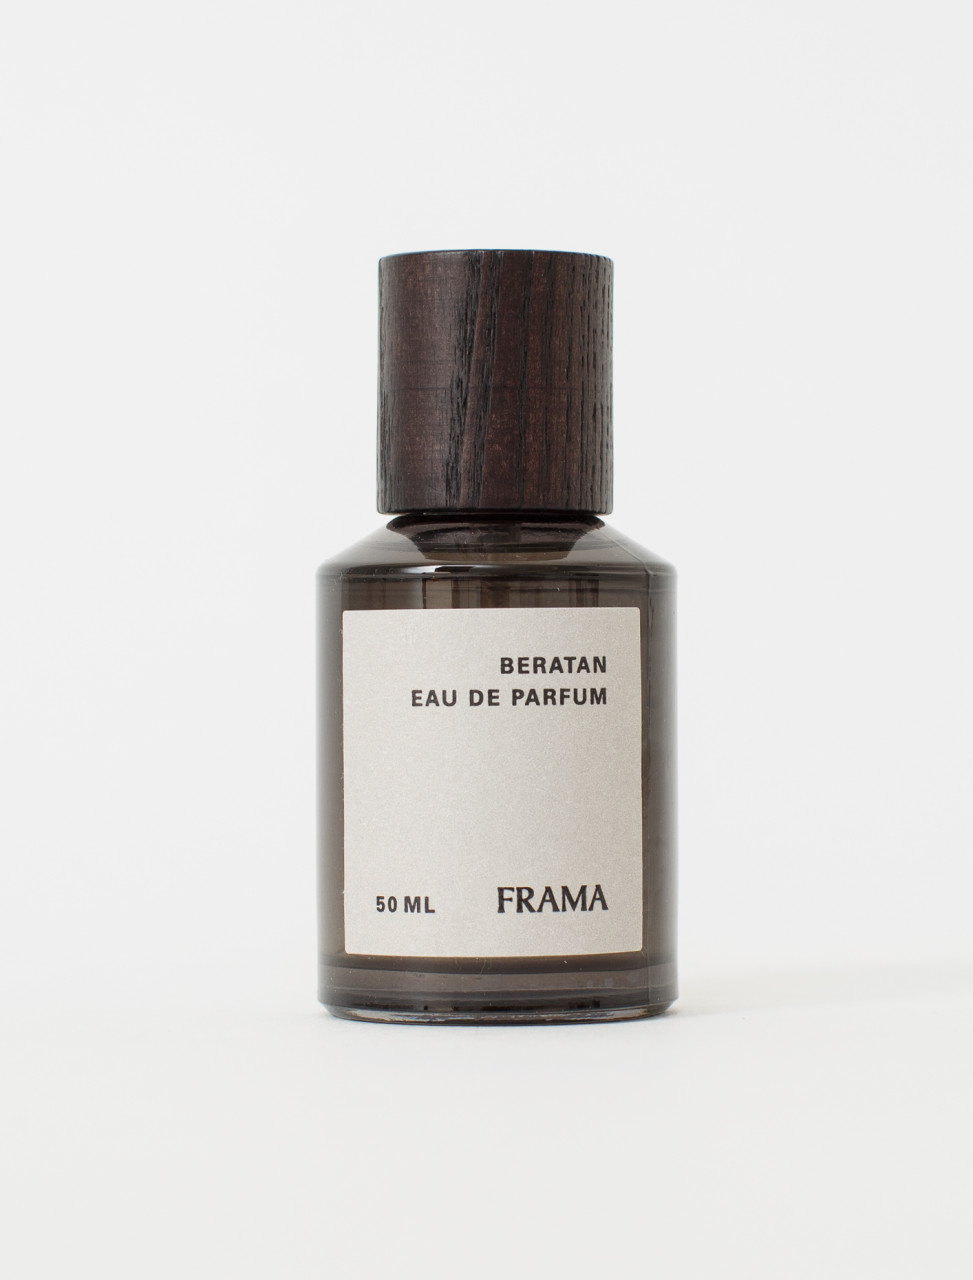 Beratan | Eau de Parfum 50 ml